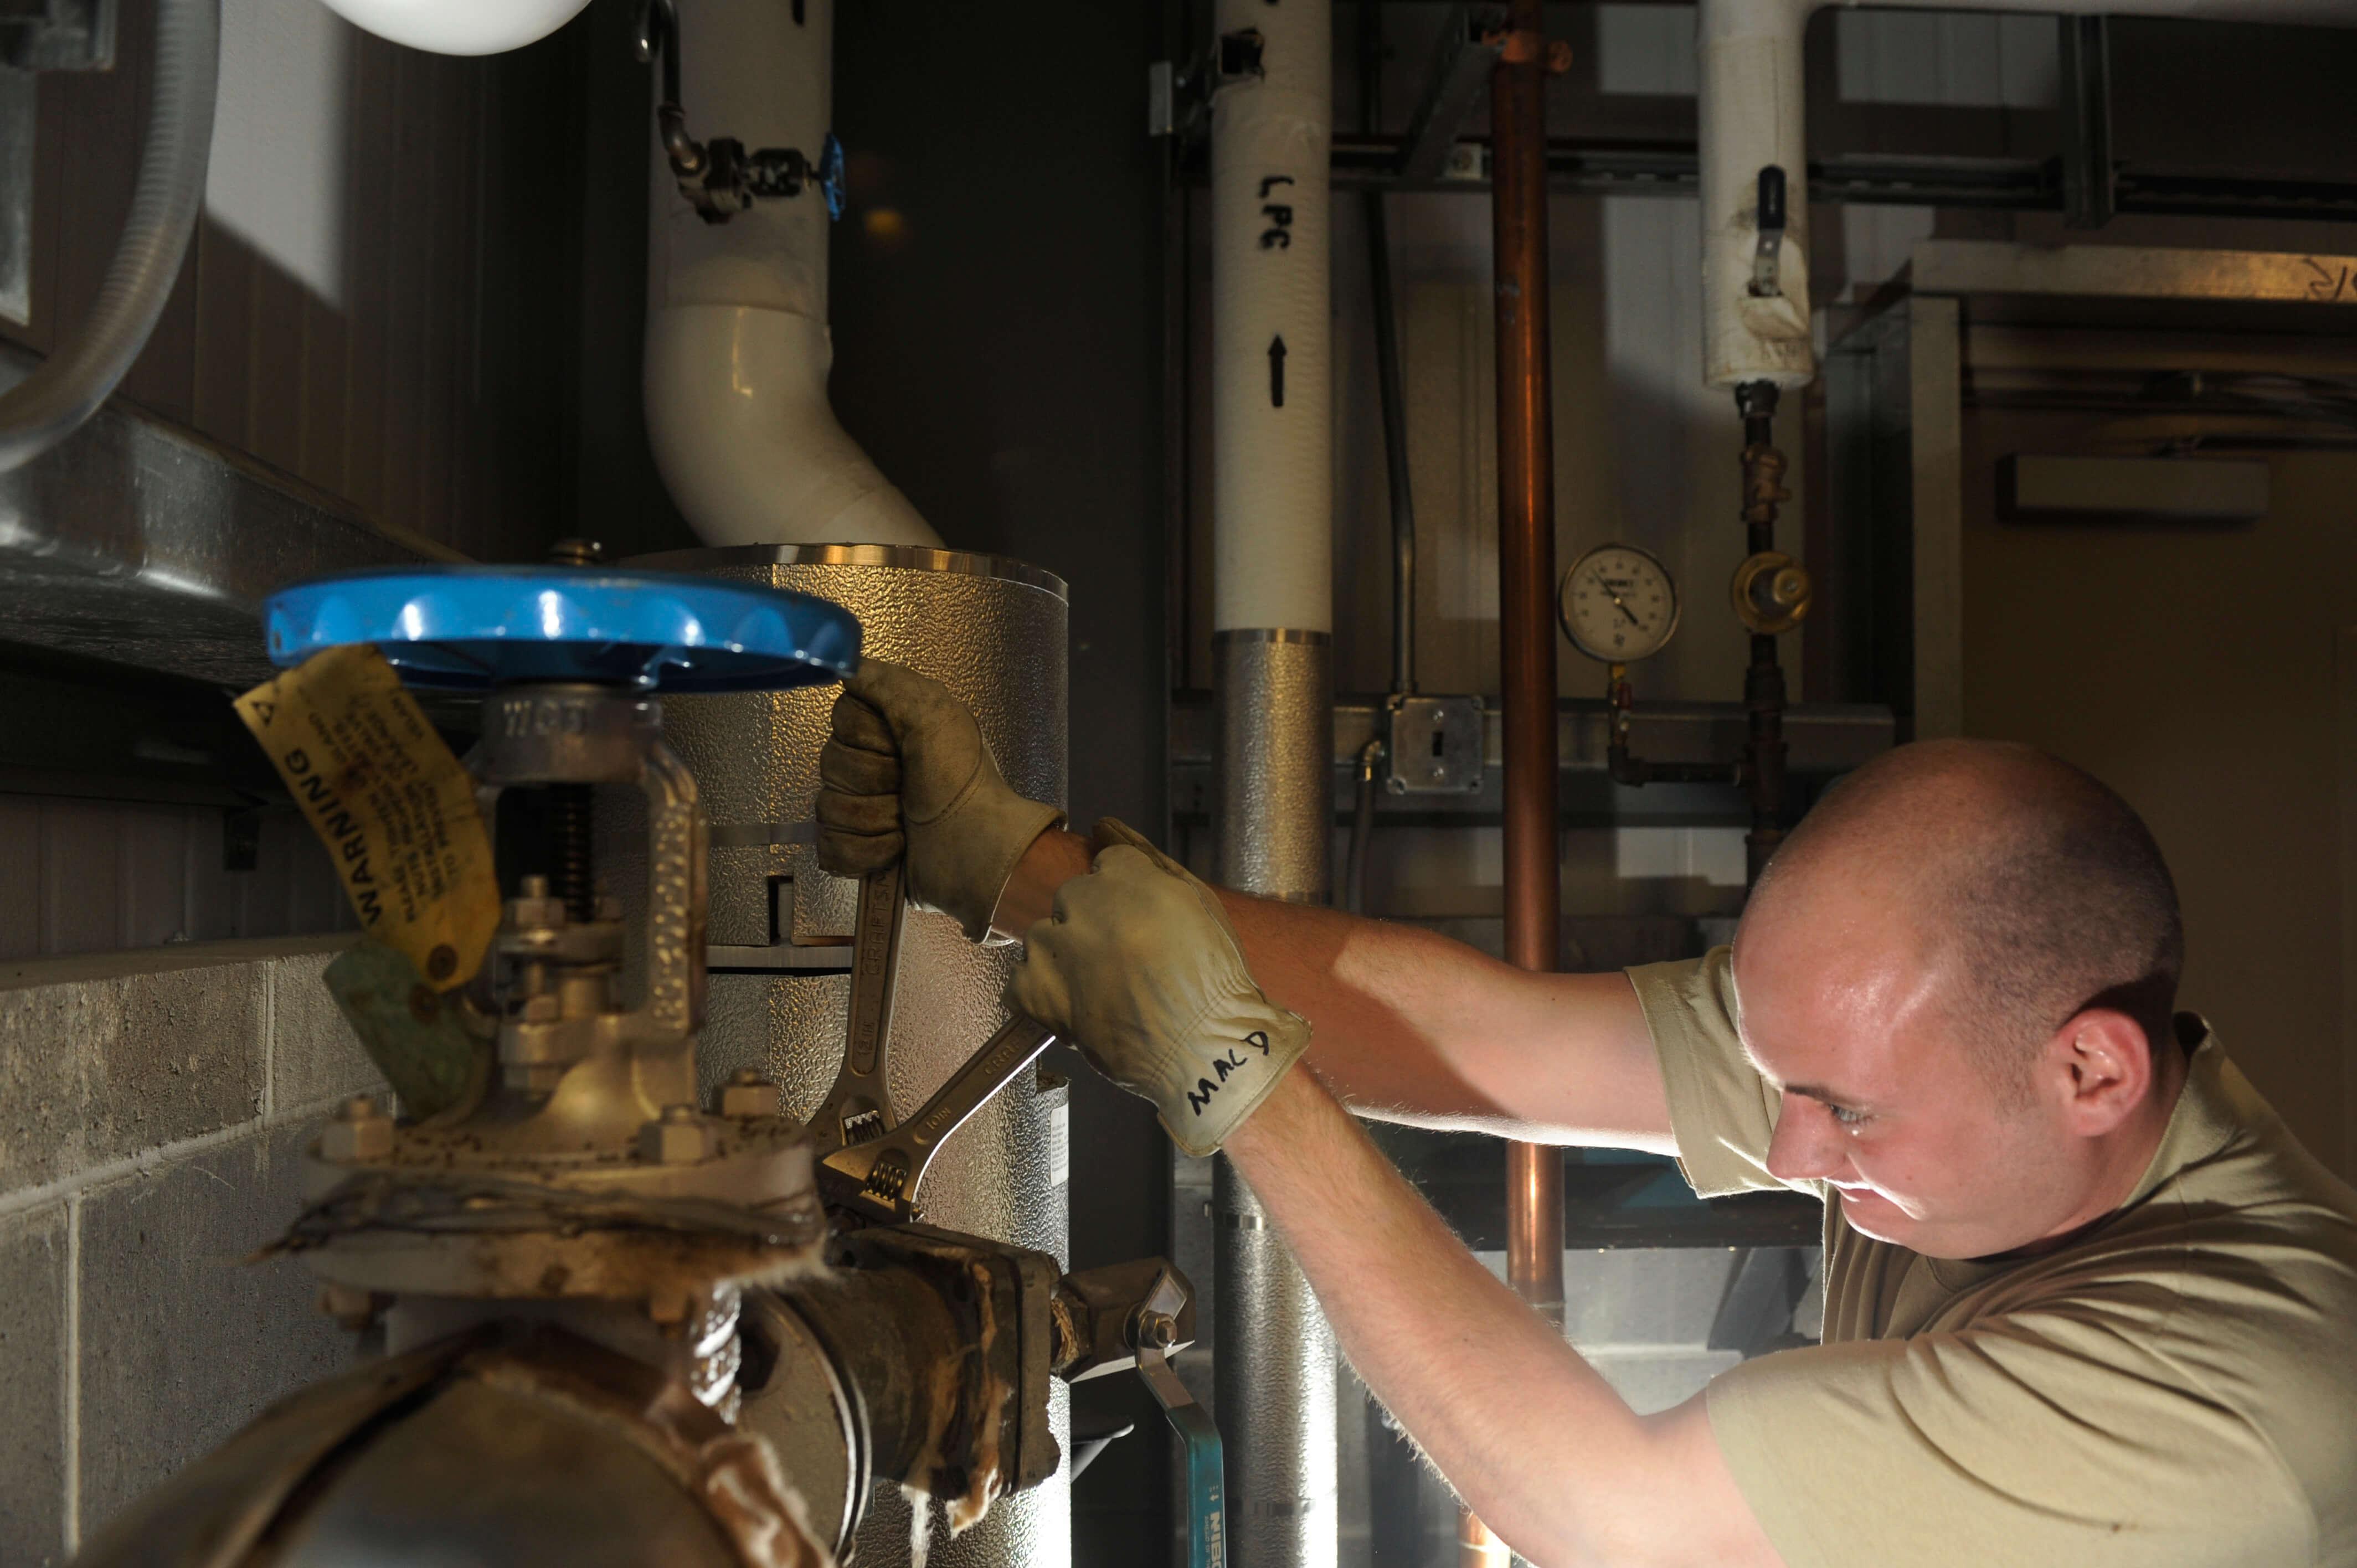 Heater Repair Cost in Frisco TX